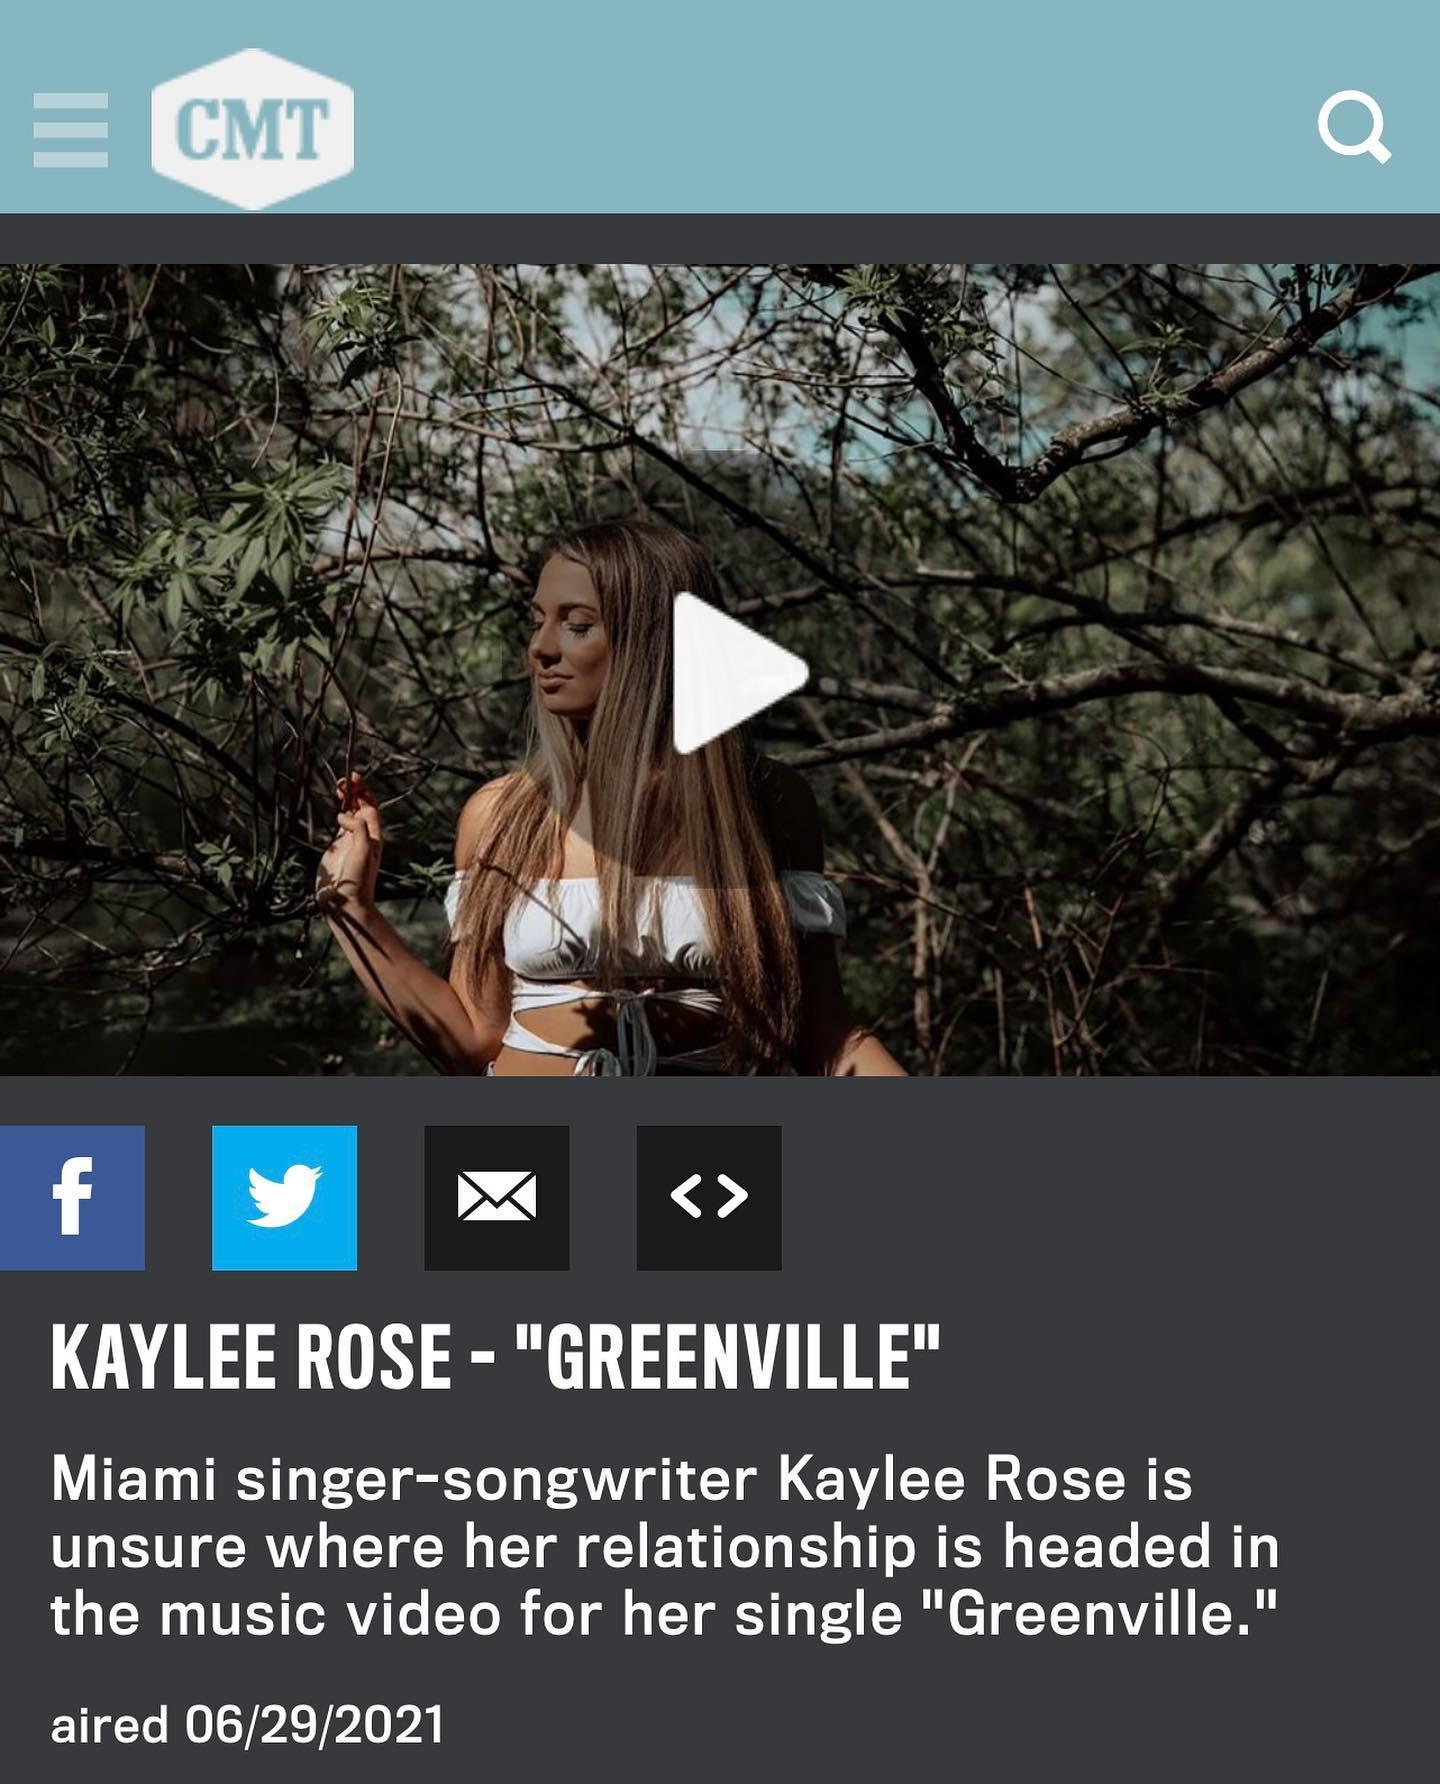 Greenville music video premiere on CMT.com